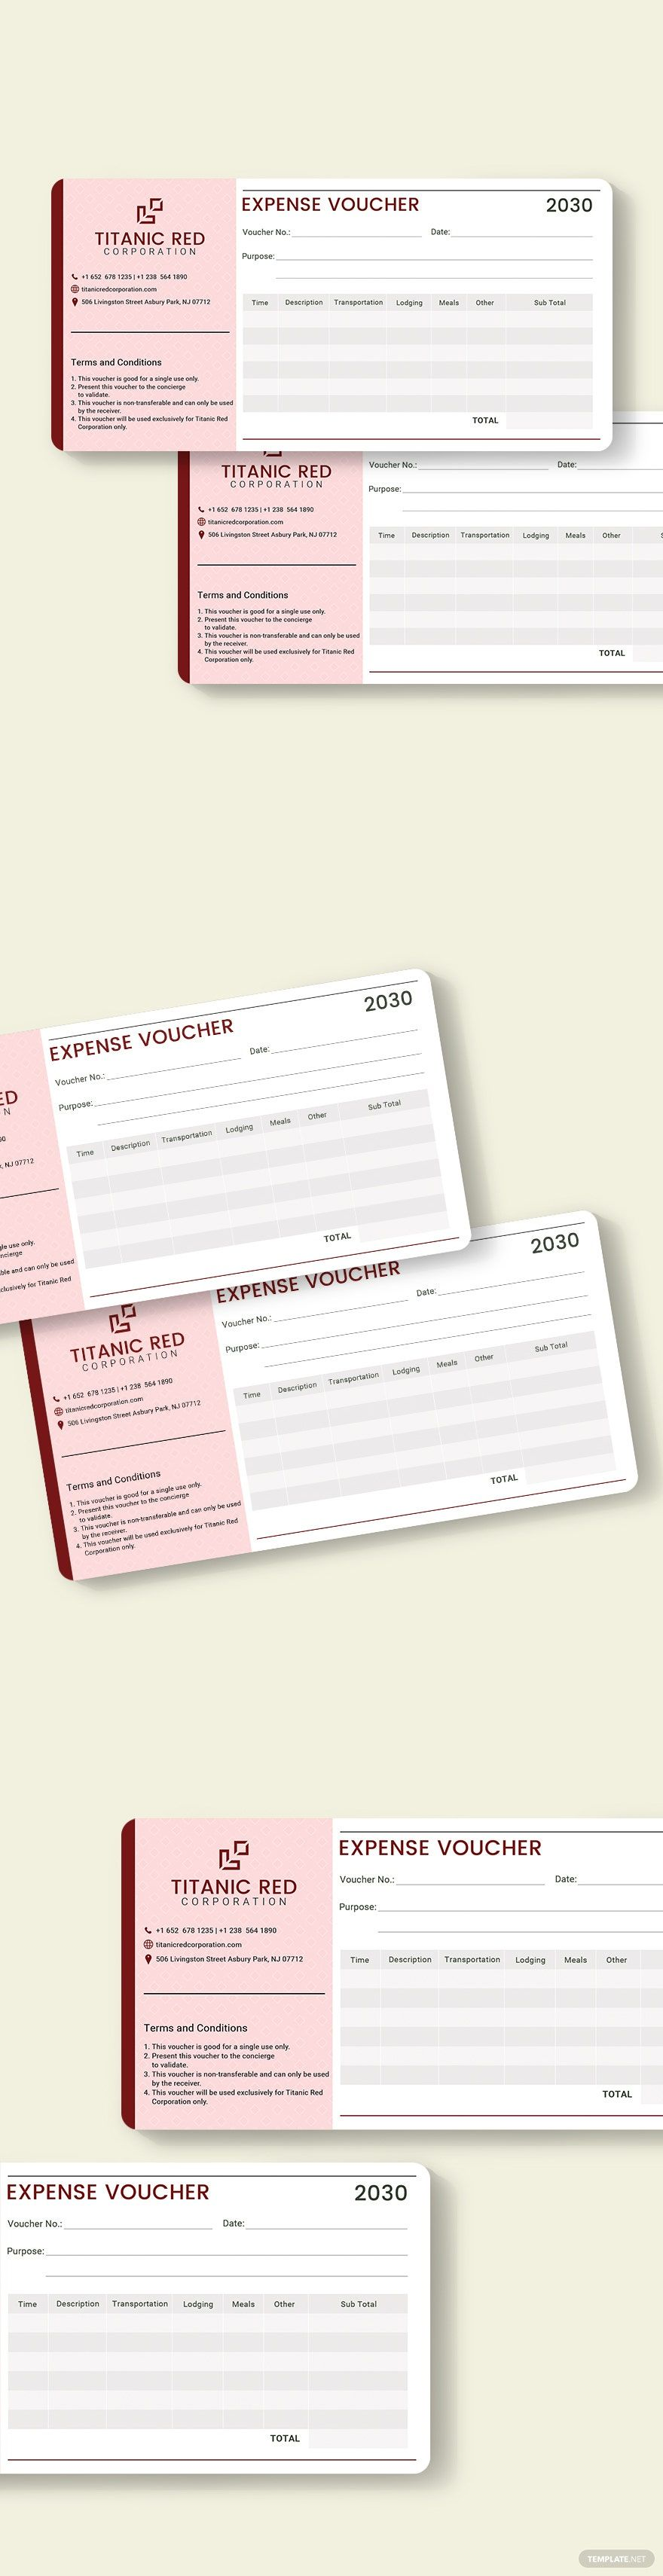 Cash Expense Voucher Template in 2020 | Templates, Voucher ...